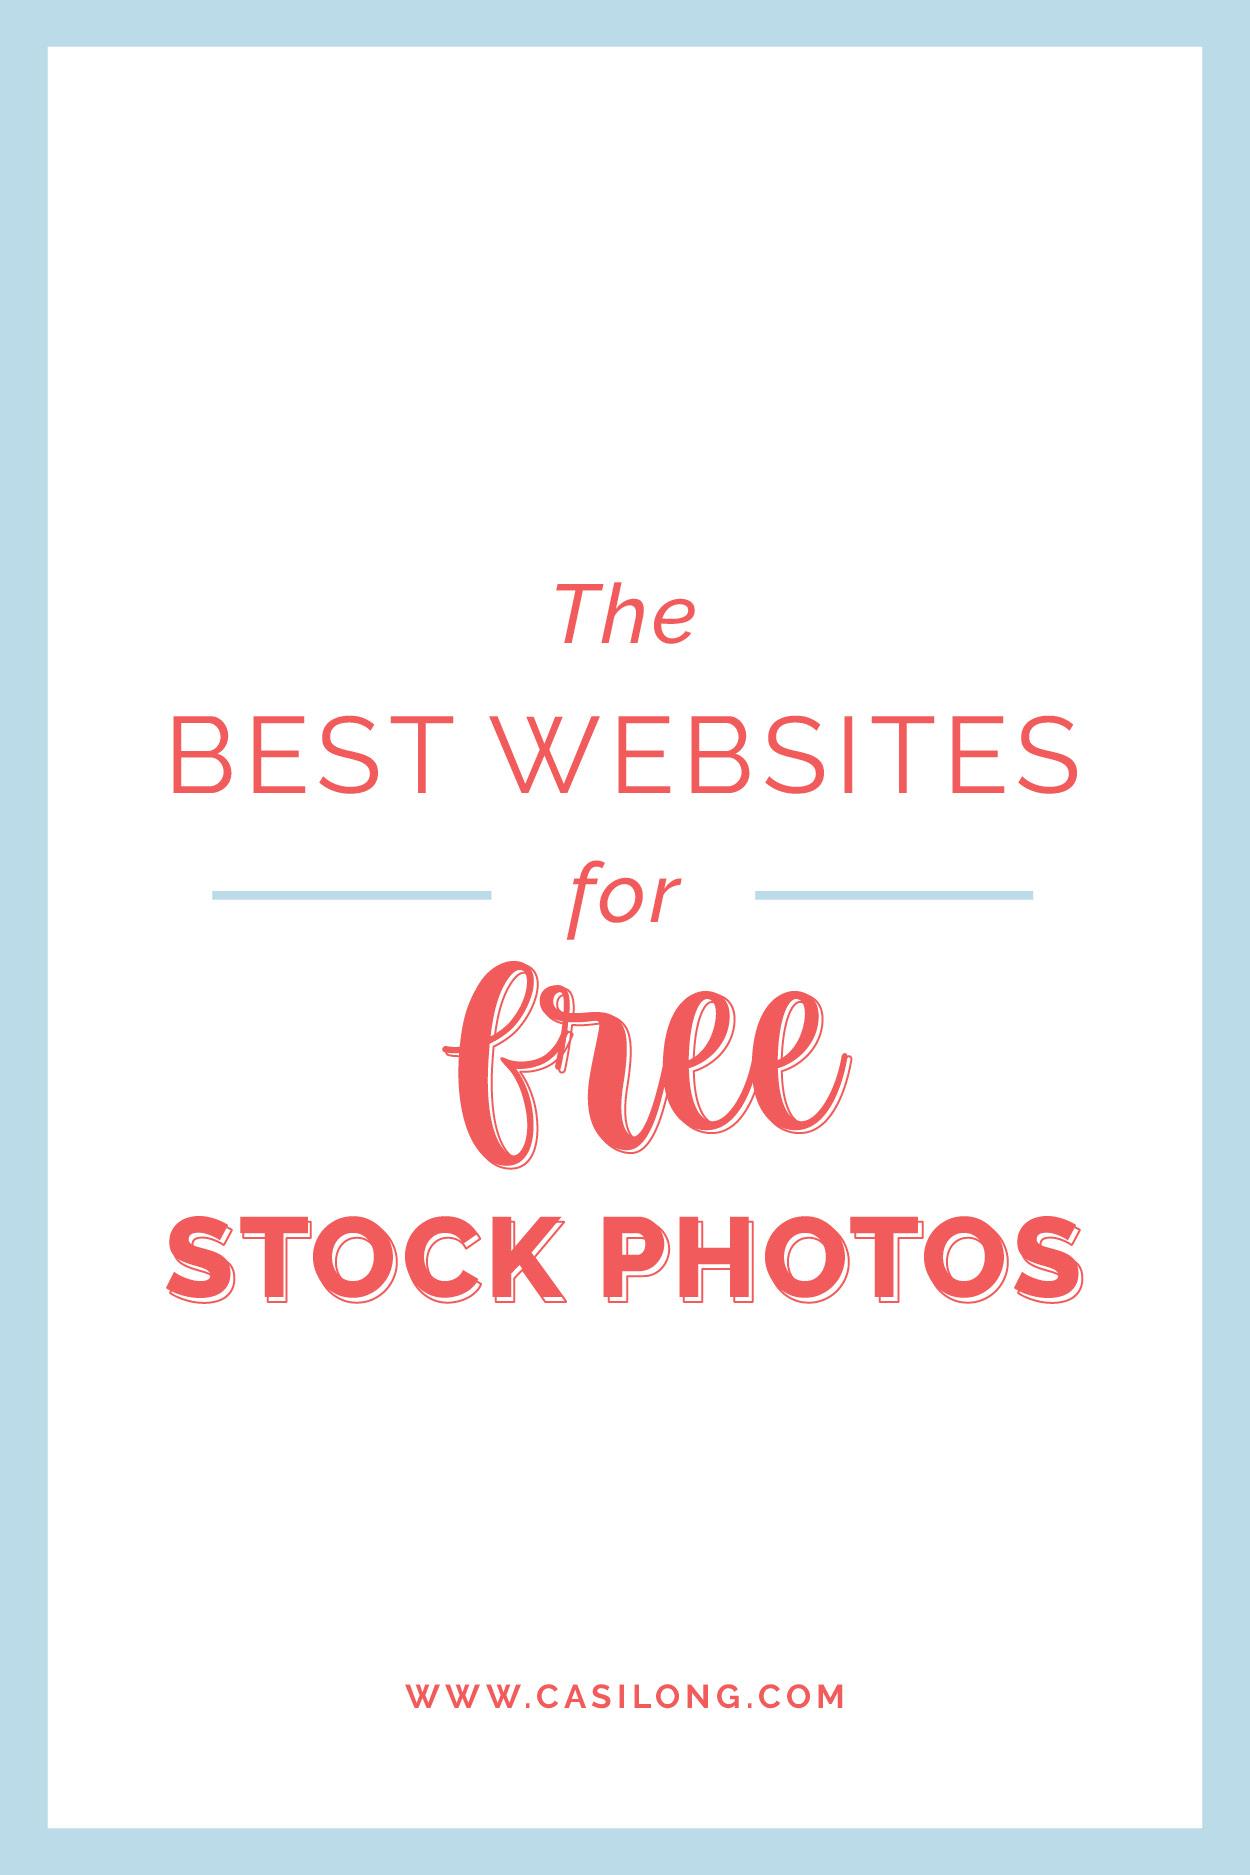 The Best Websites for Free Stock Photos | casilong.com #casilongdesign #fearlesspursuit